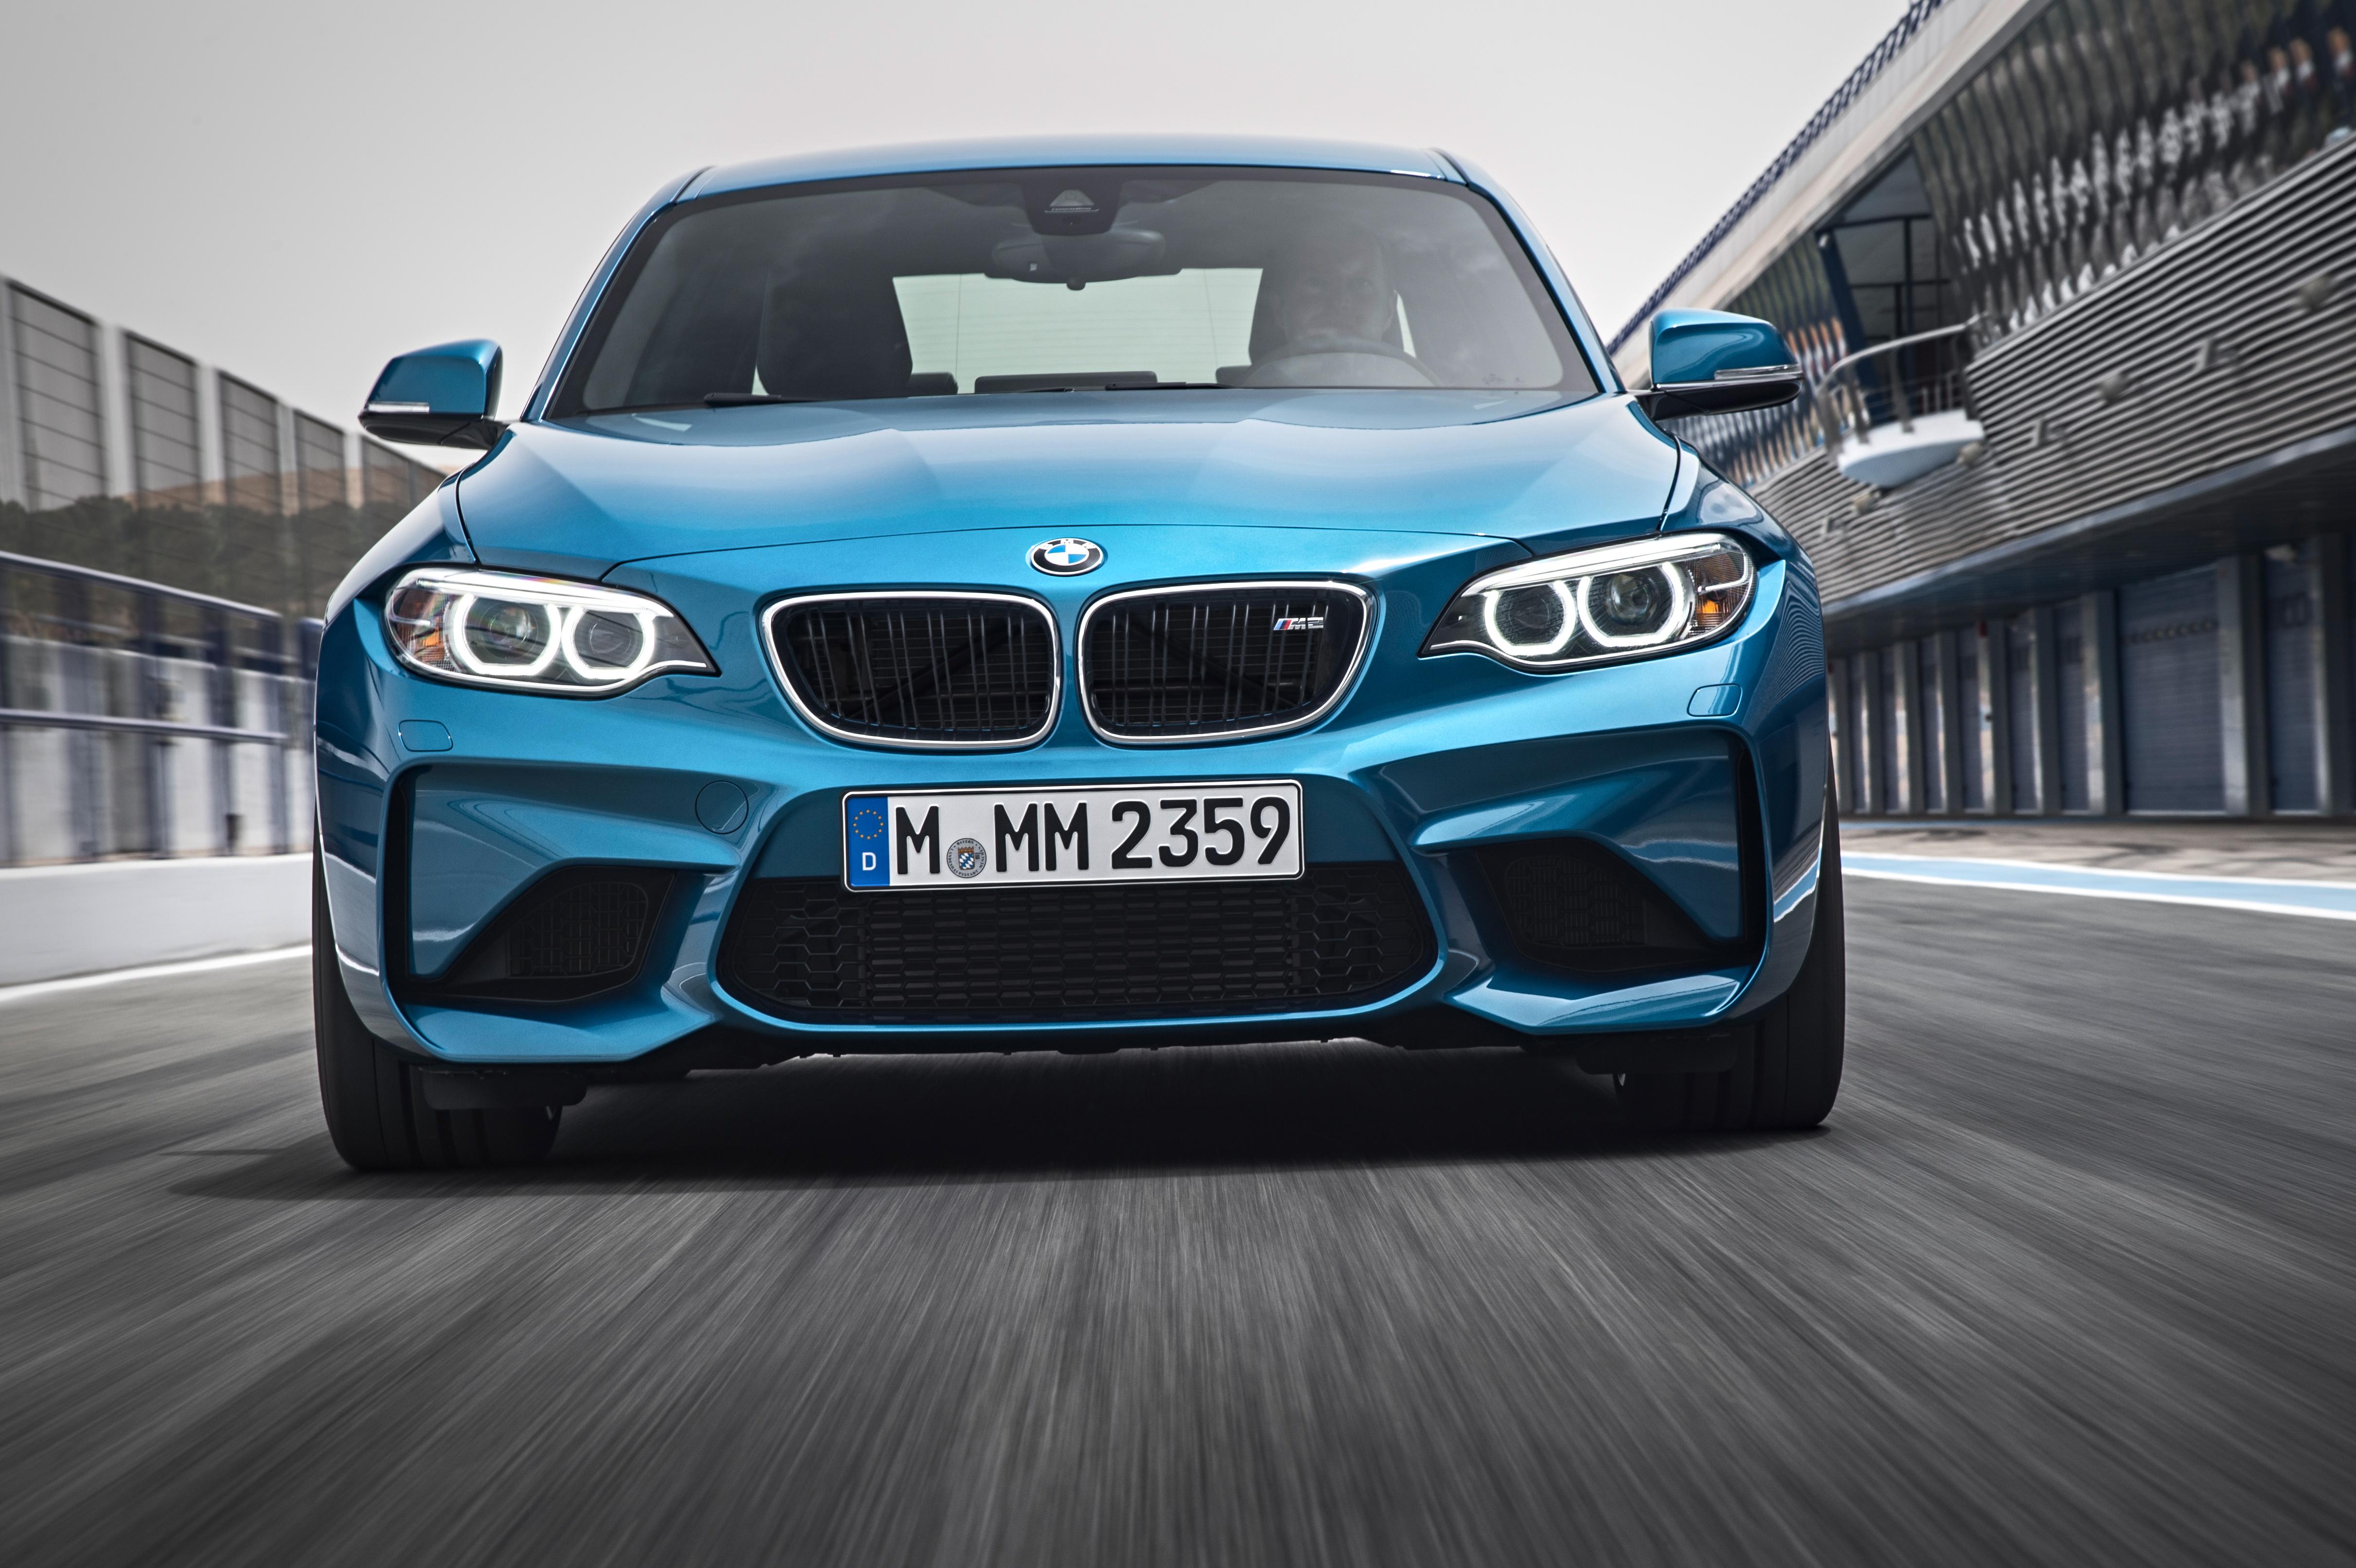 BMW M2 Coupé 2